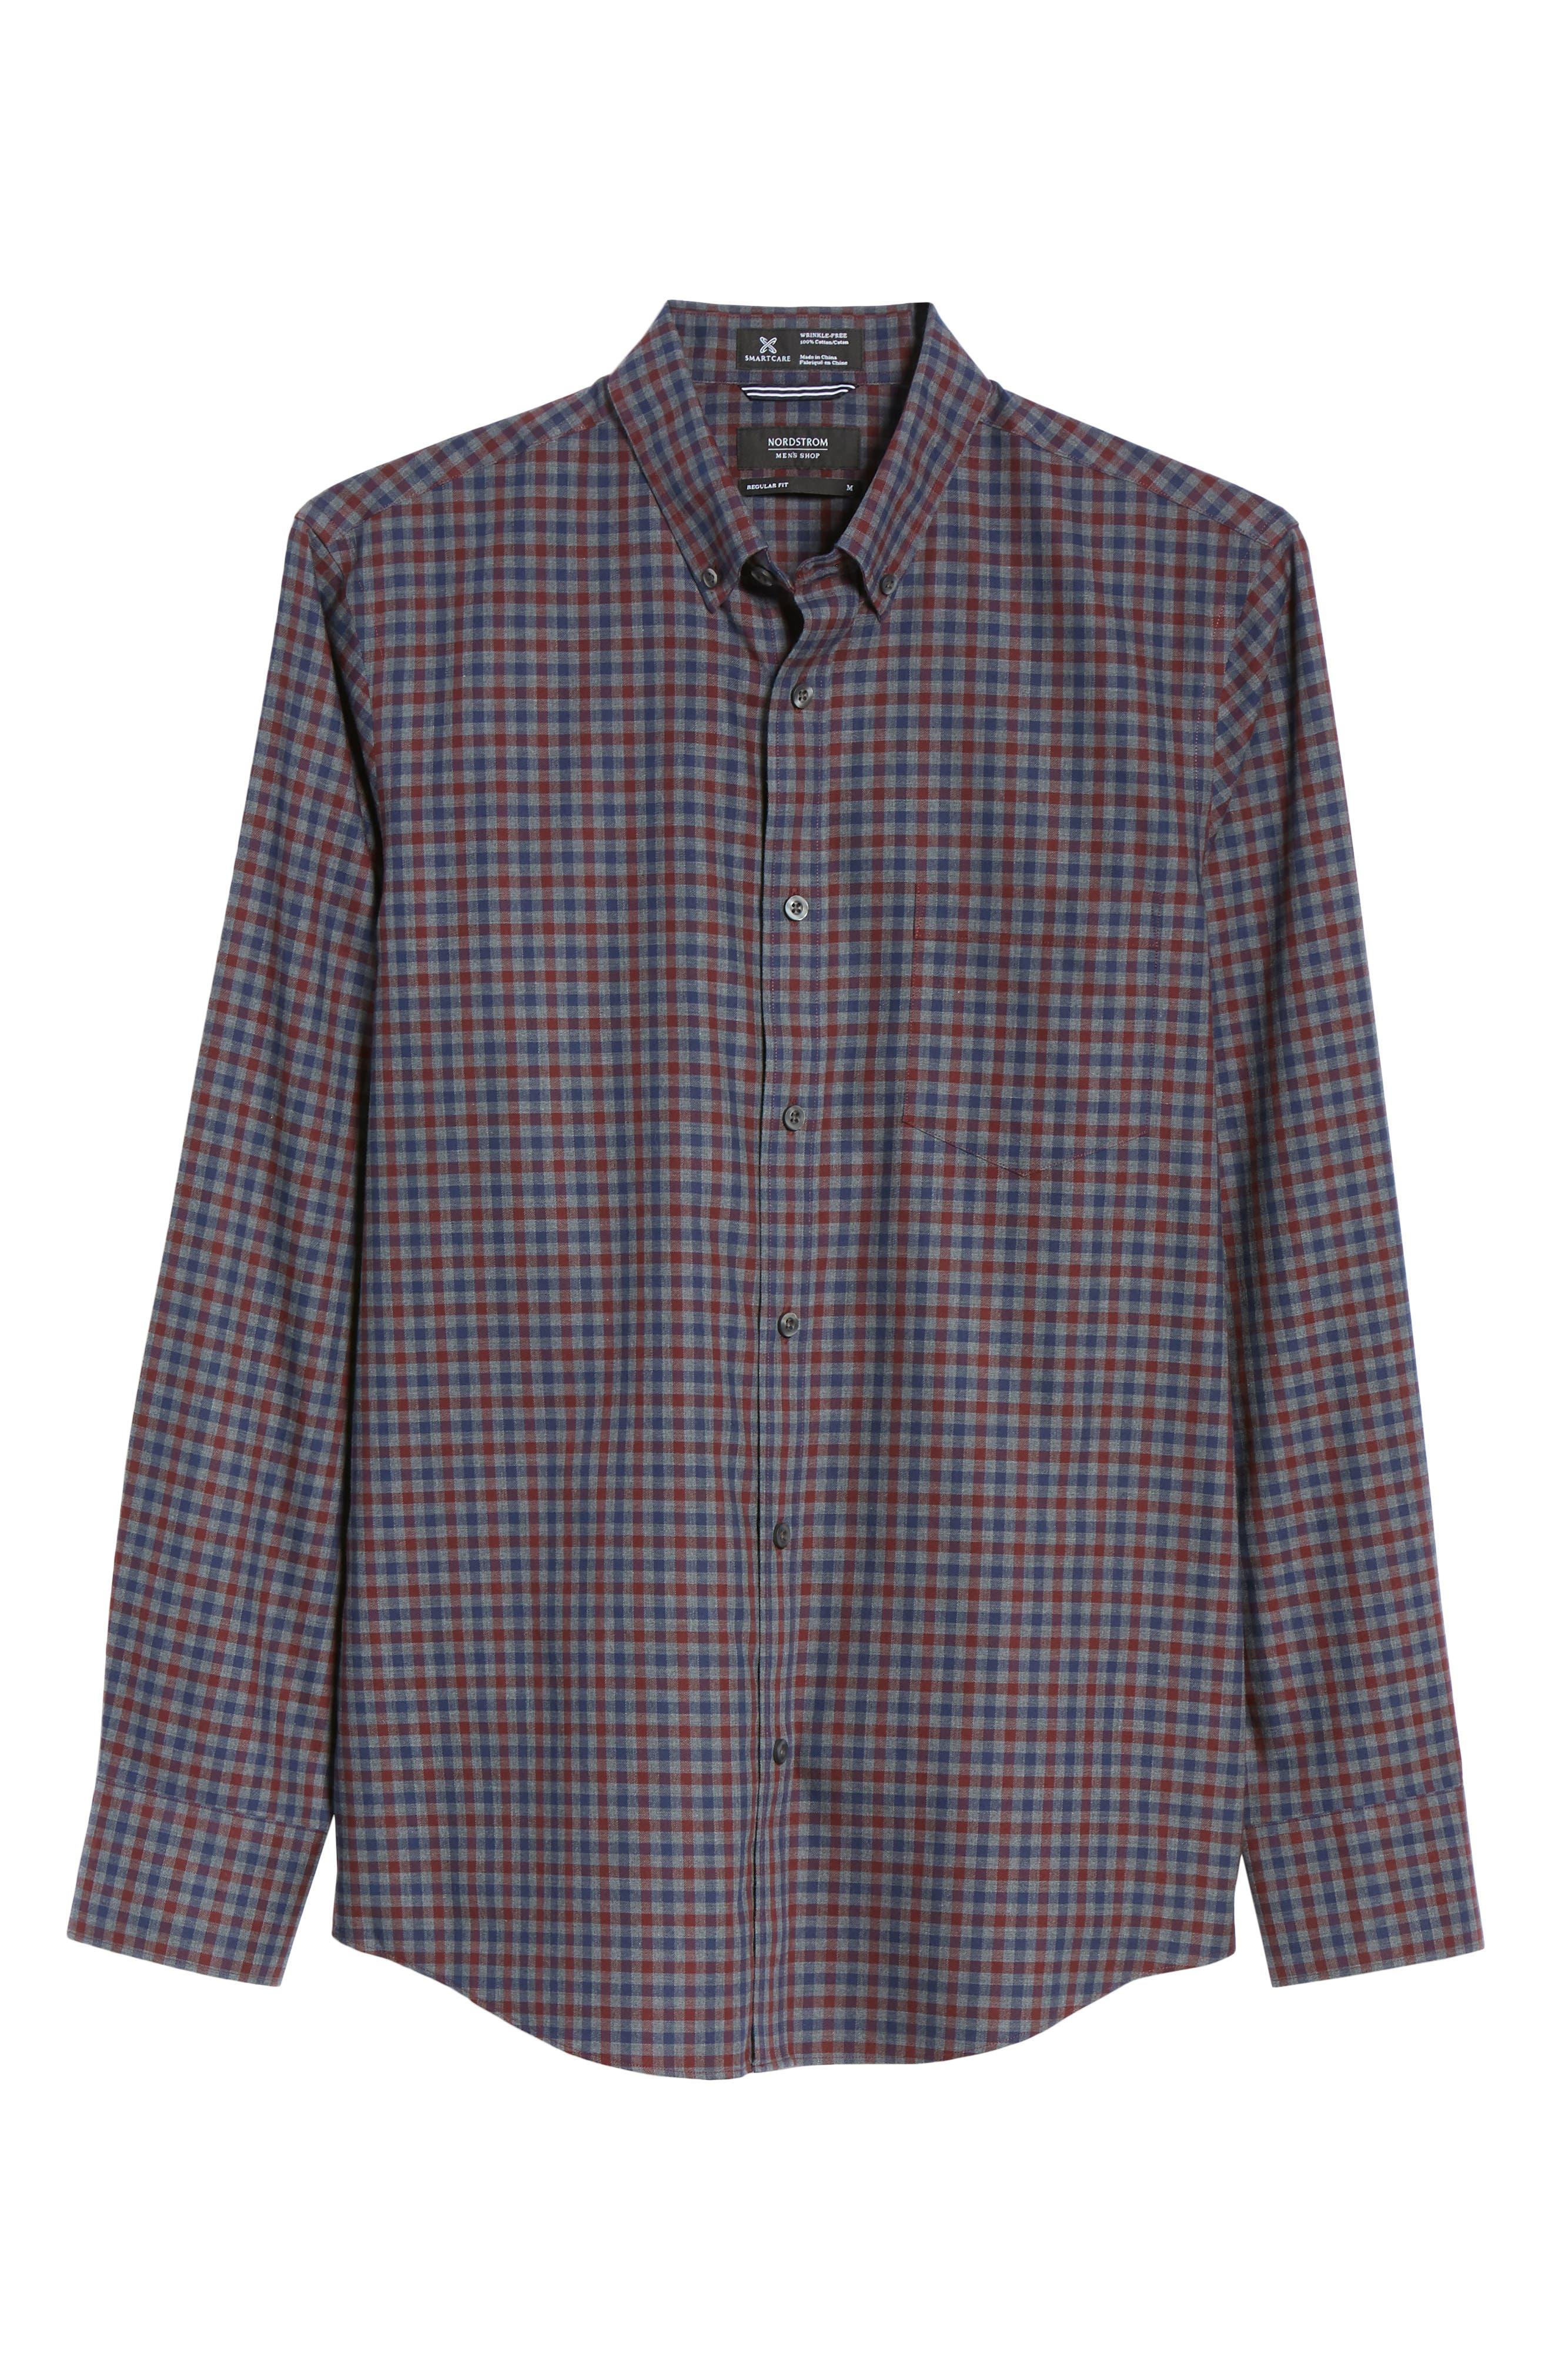 Smartcare<sup>™</sup> Regular Fit Check Sport Shirt,                             Alternate thumbnail 5, color,                             BURGUNDY ROYALE NAVY CHECK